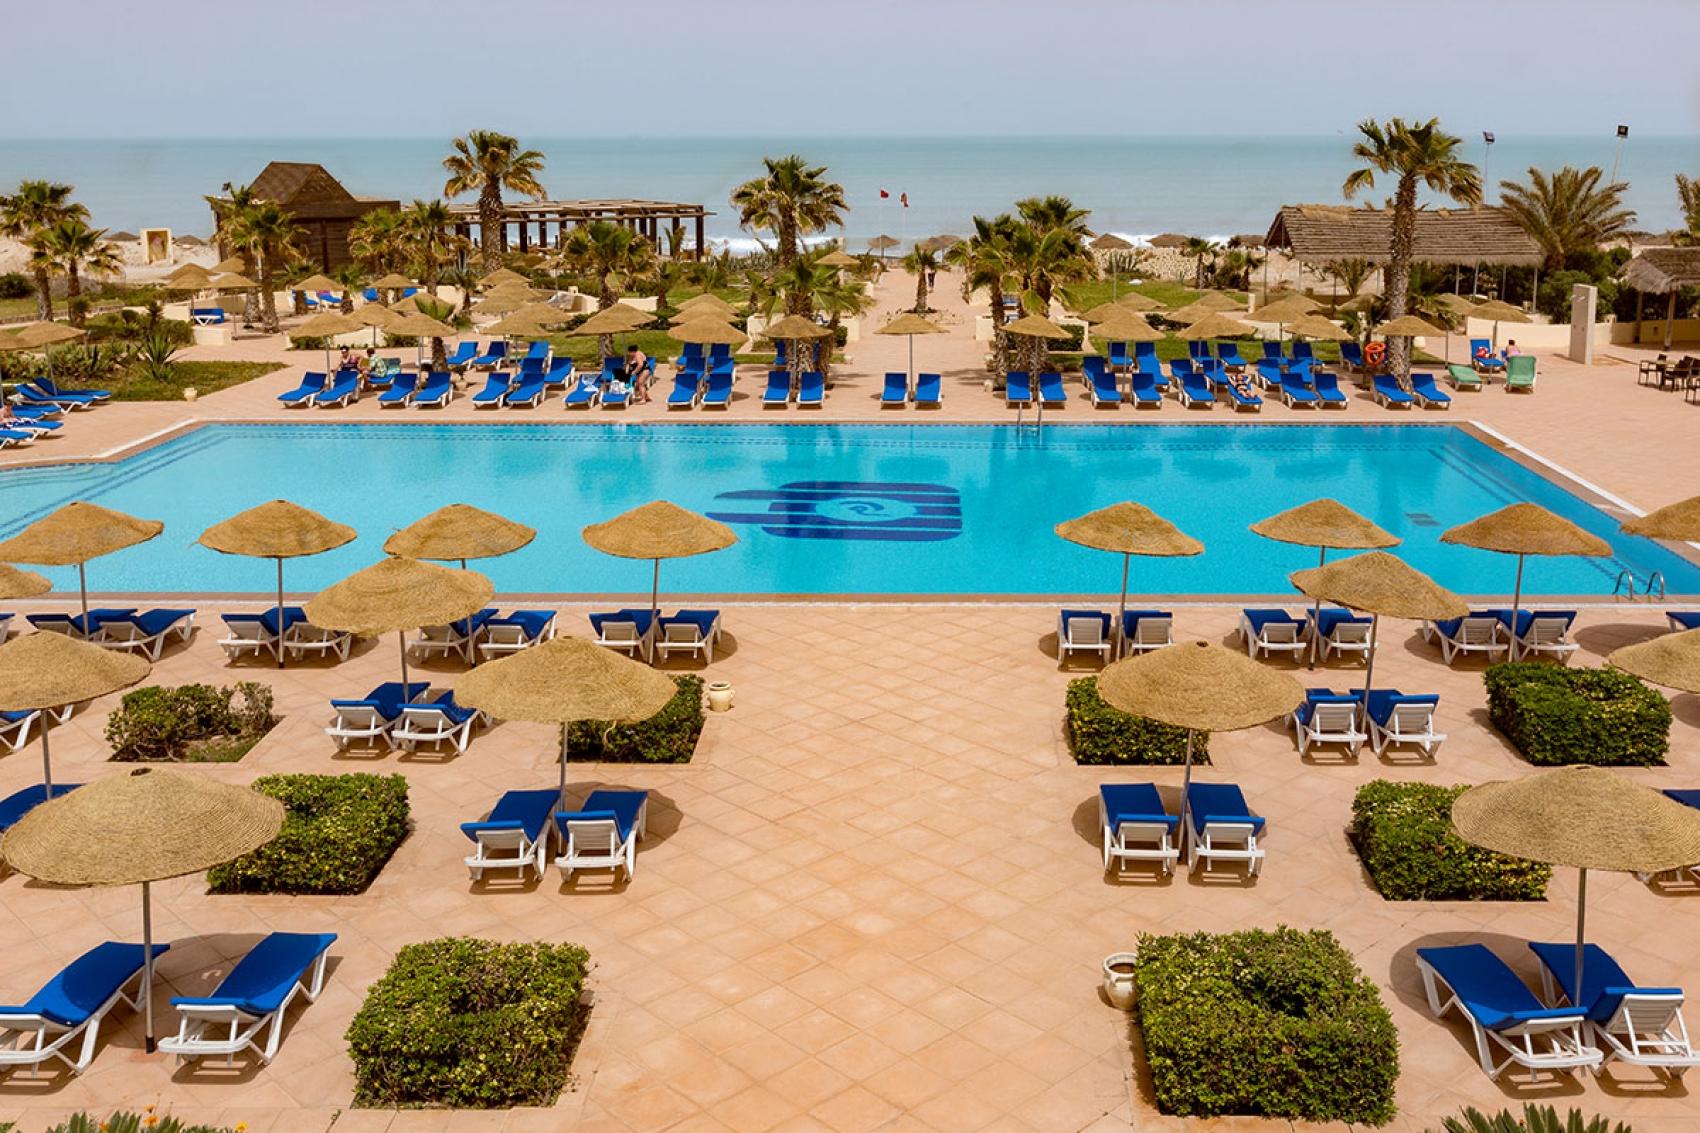 Séjour à Djerba - Hôtel Club